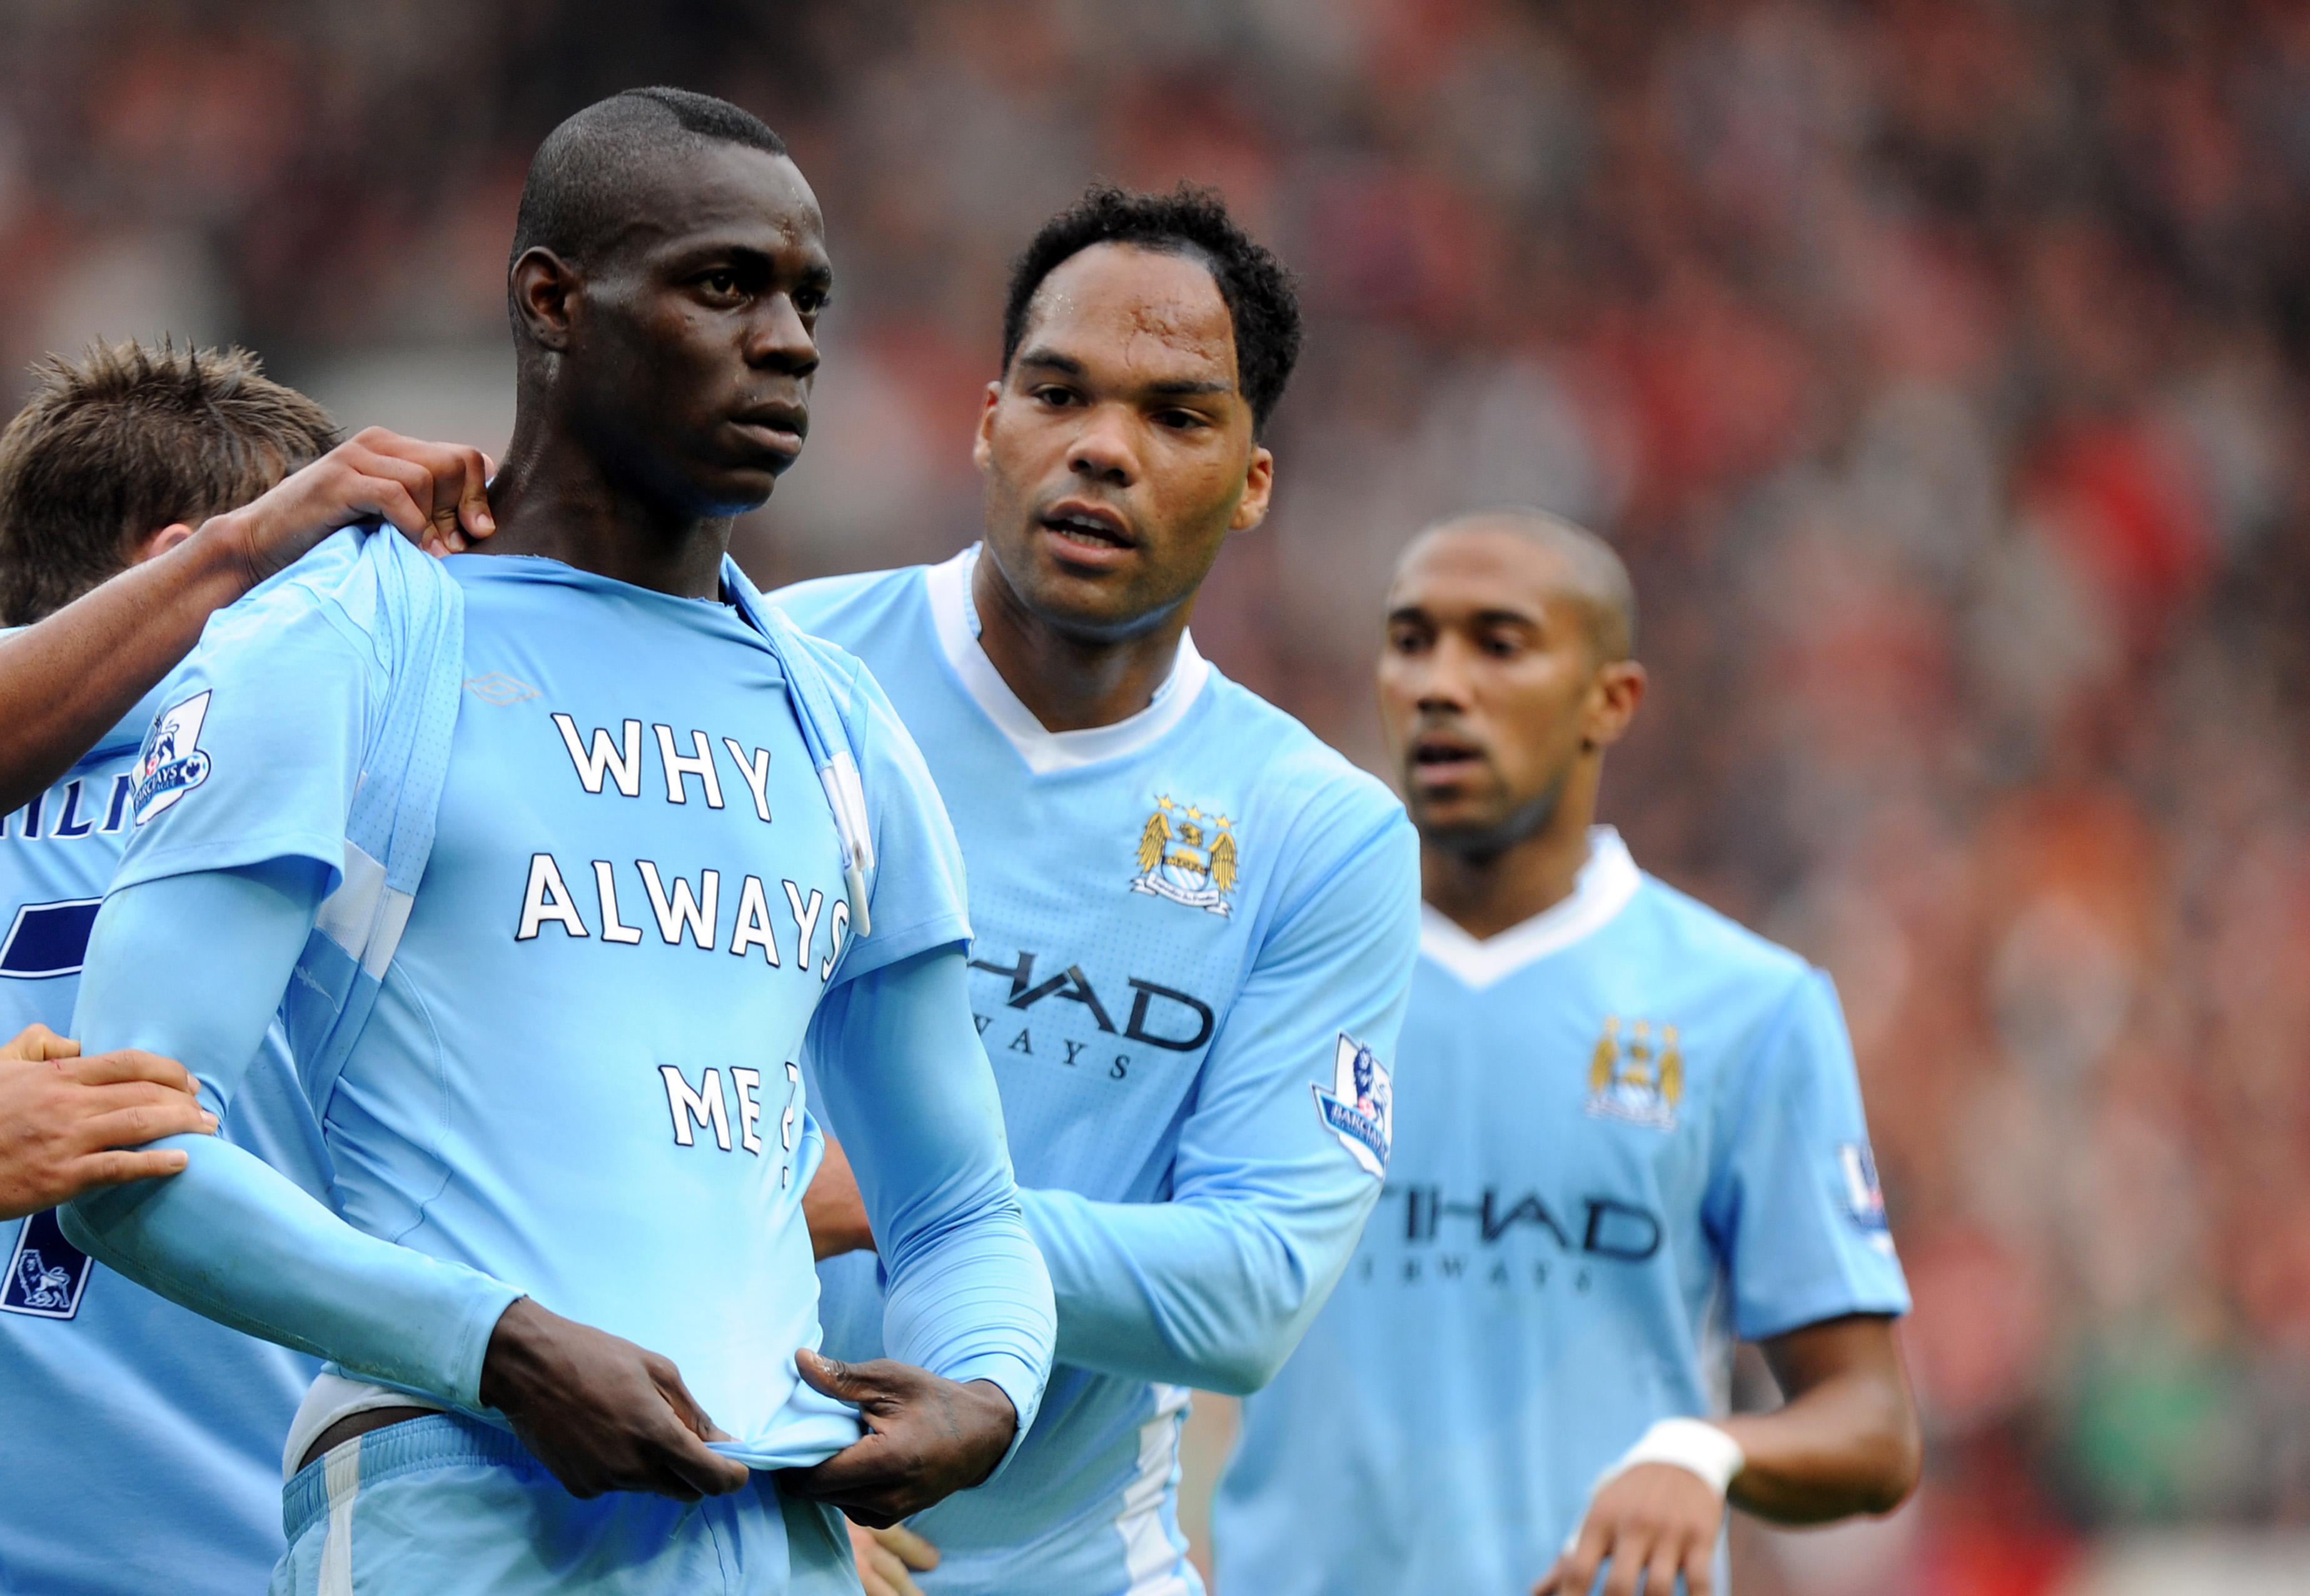 SOCCER - Barclays Premier League - Manchester United v Manchester City